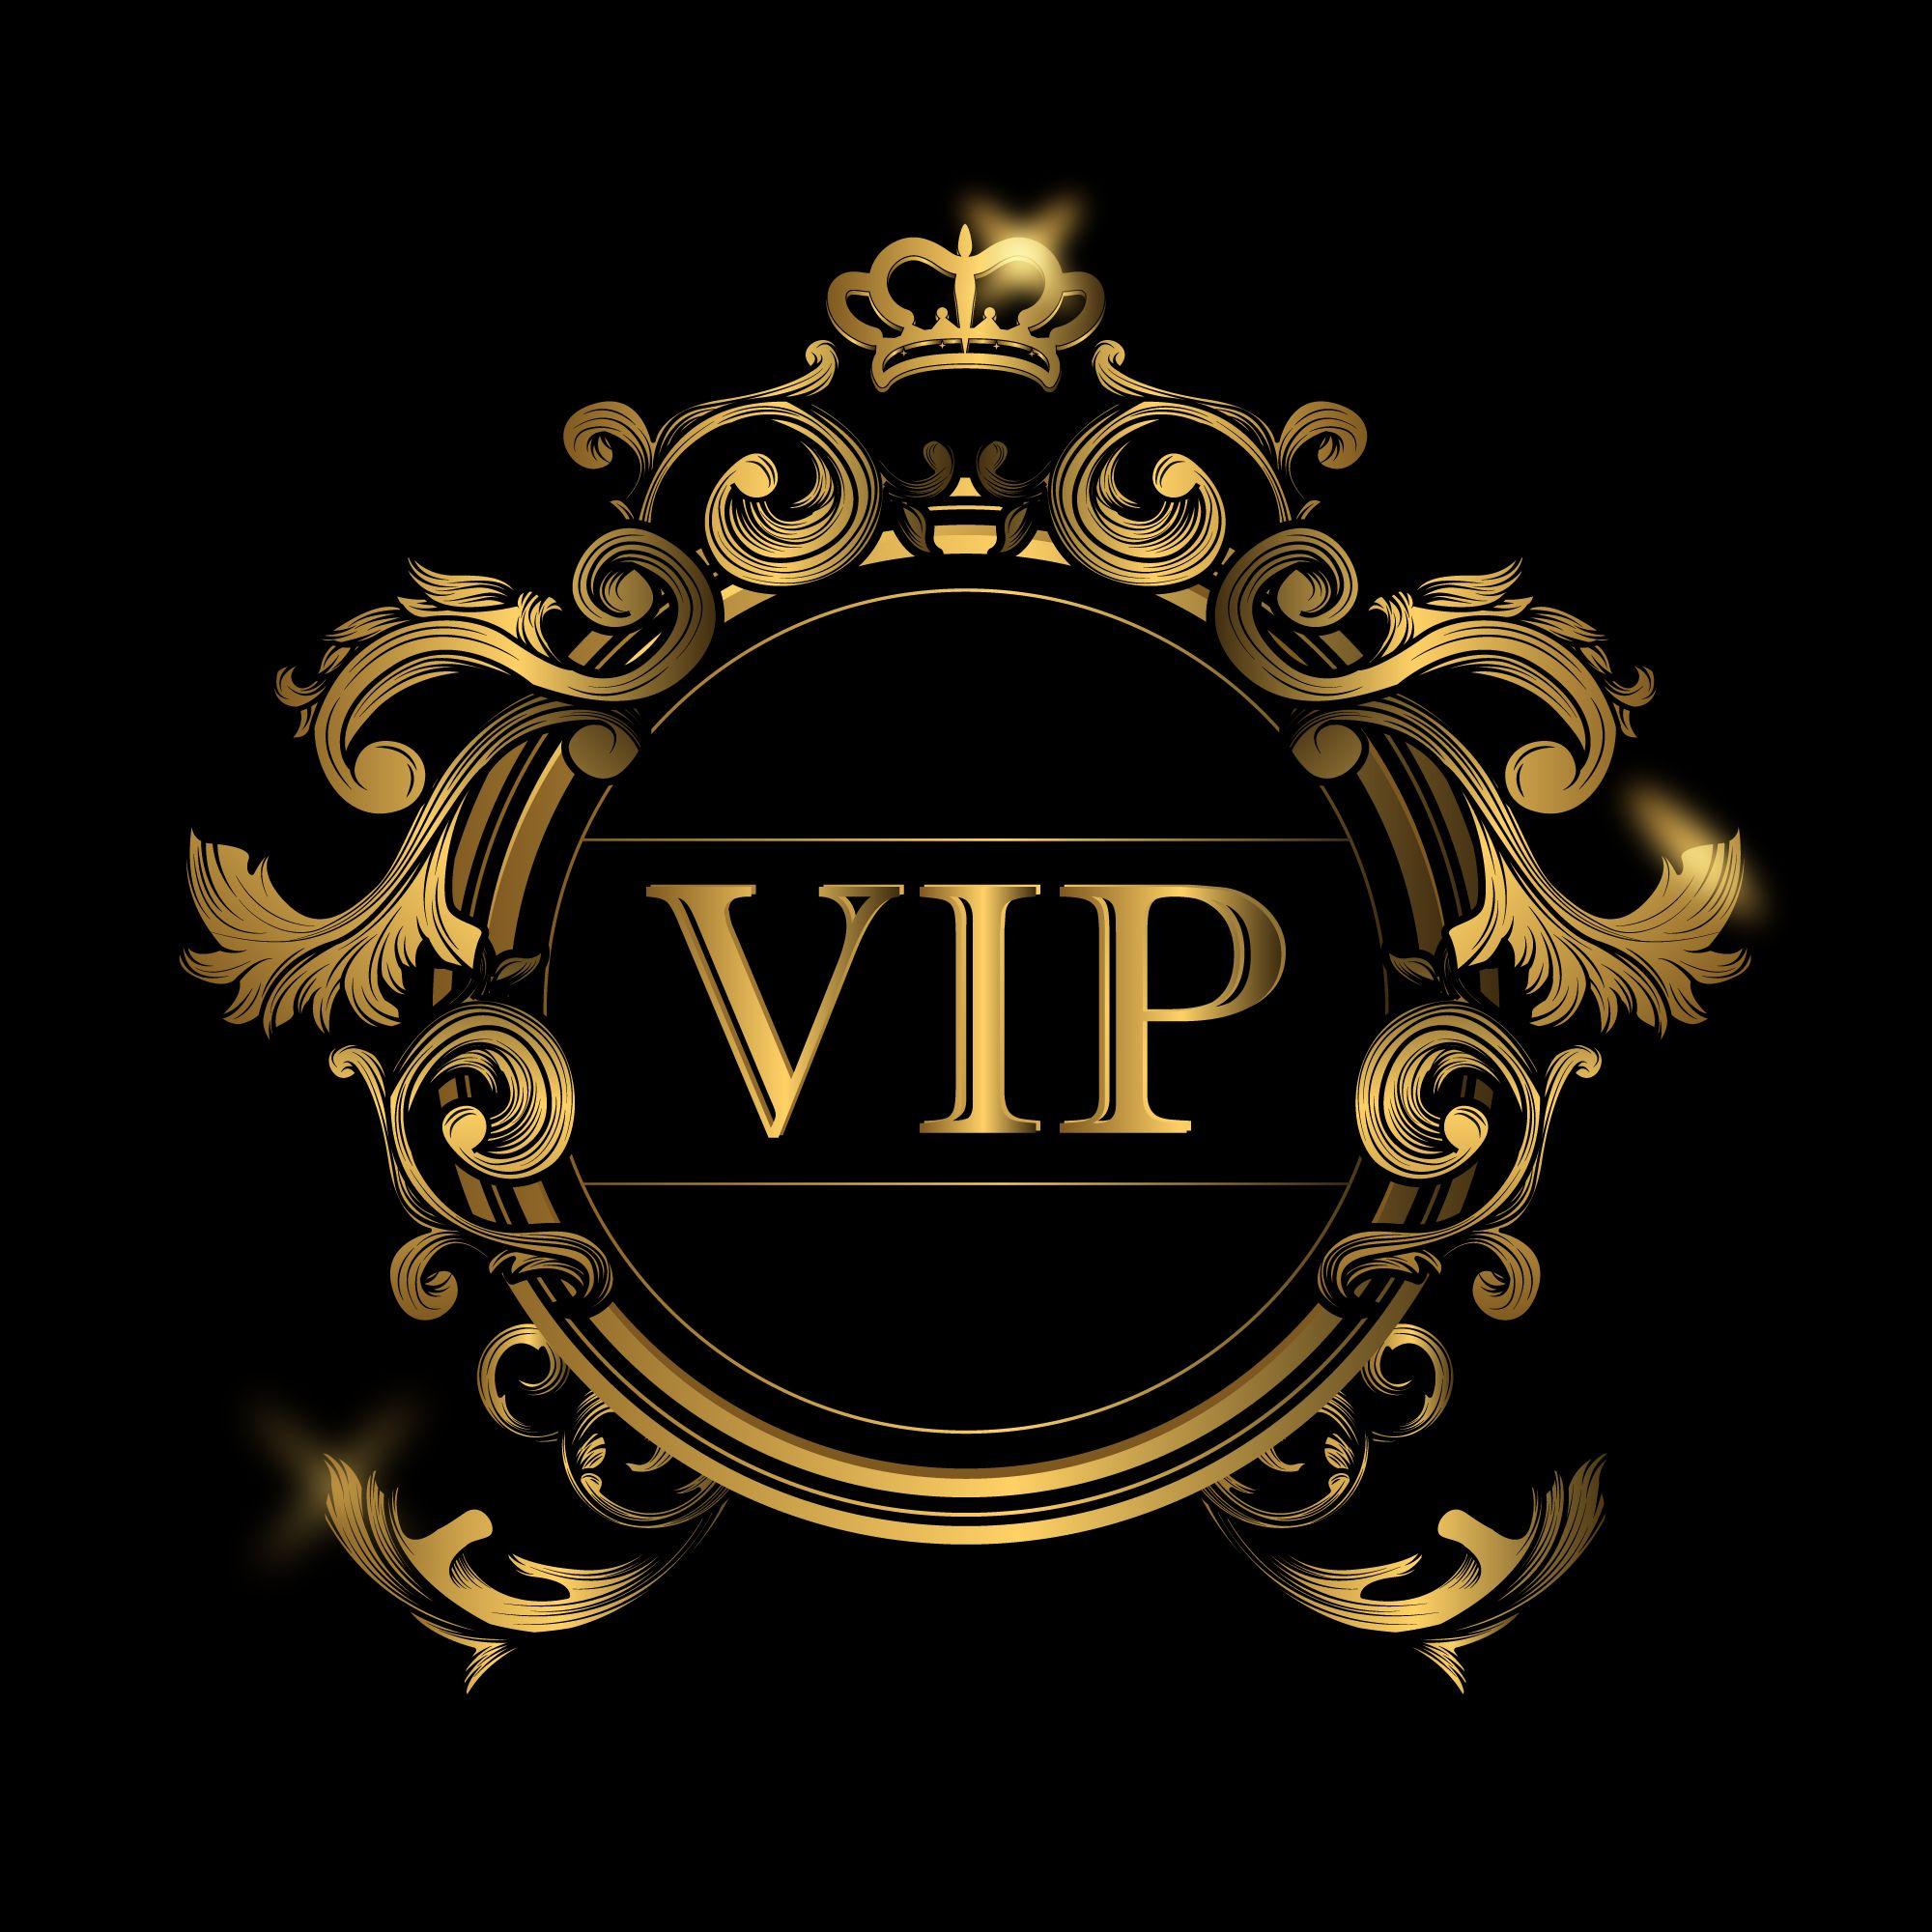 Vip logo by EURO DESIGN on LOGO DESIN | Background design